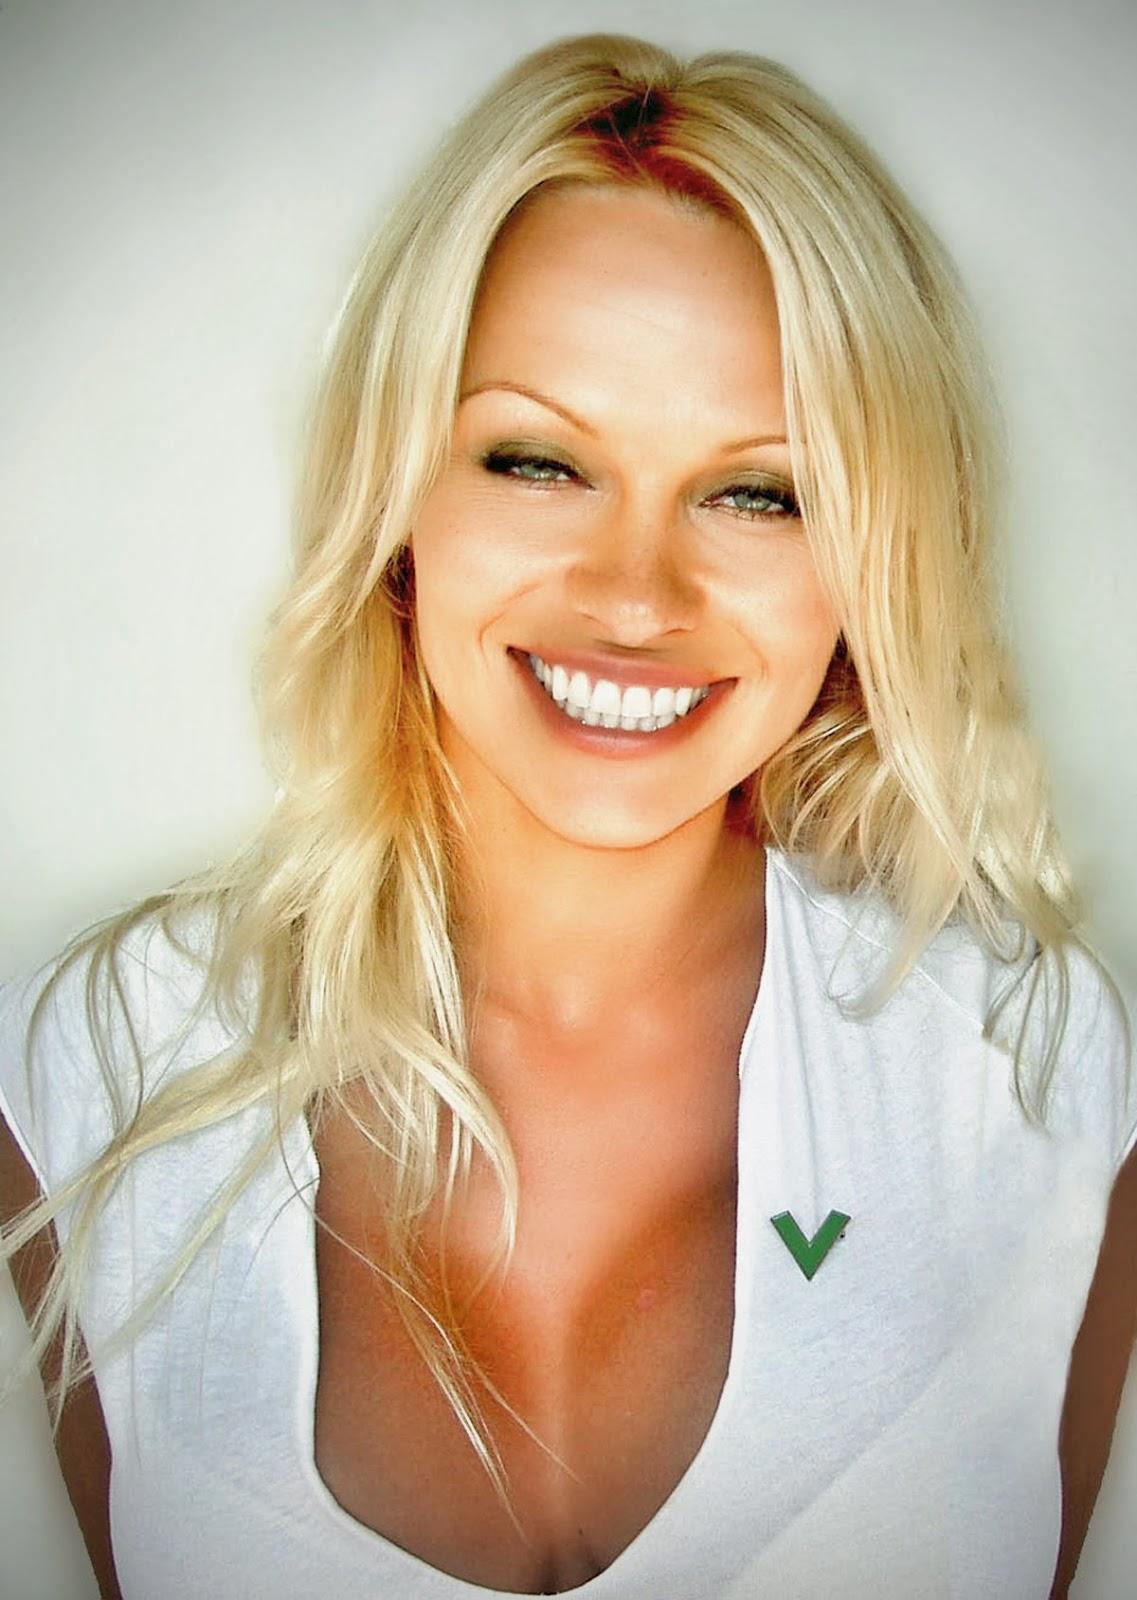 Pamela Anderson - source: wikipedia